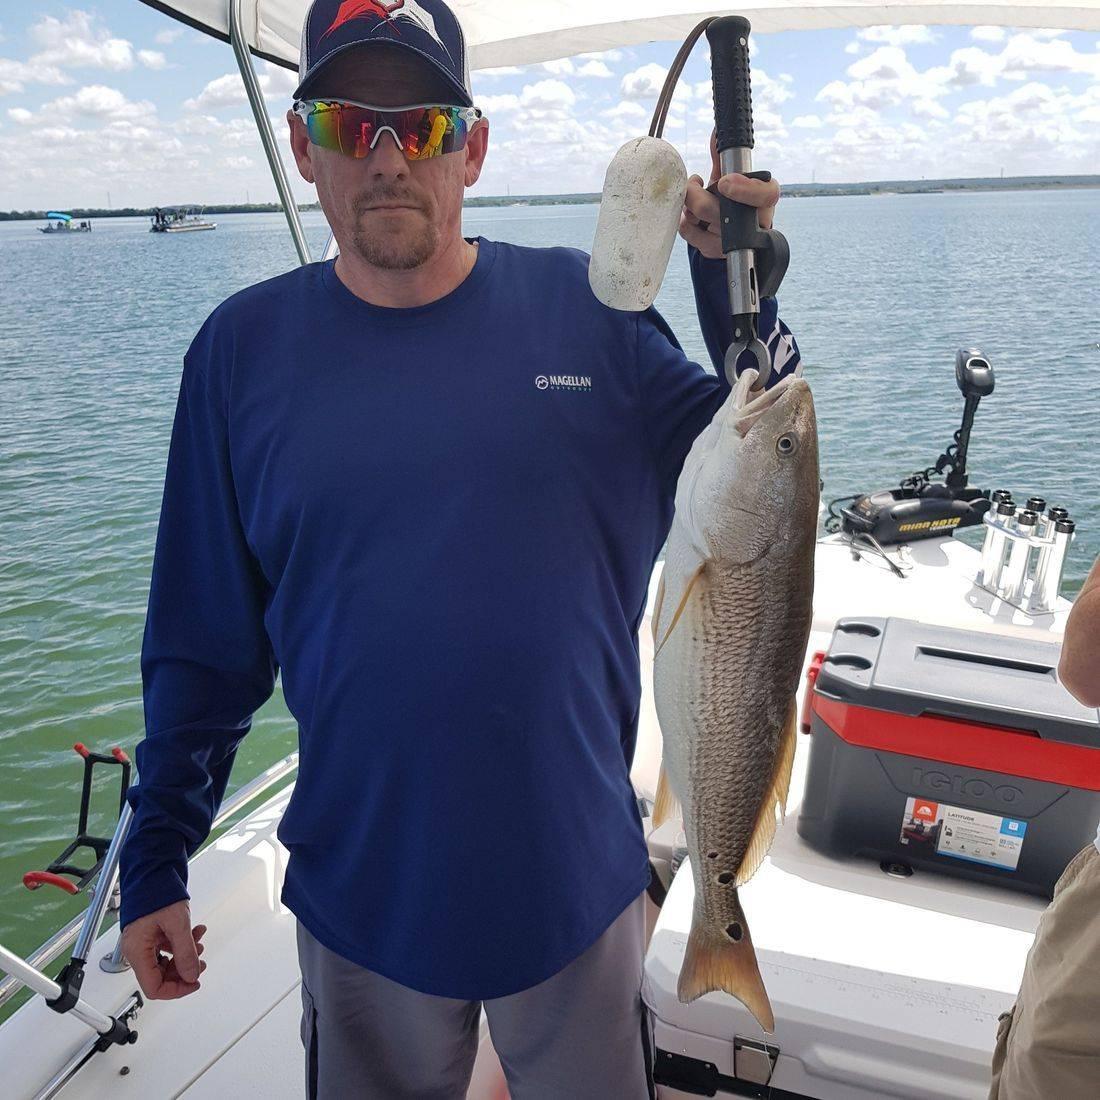 Calaveras, Braunig, Canyon, Choke Canyon Lake fishing, San Antonio , Texas, Fishing guides, Charters & Trips